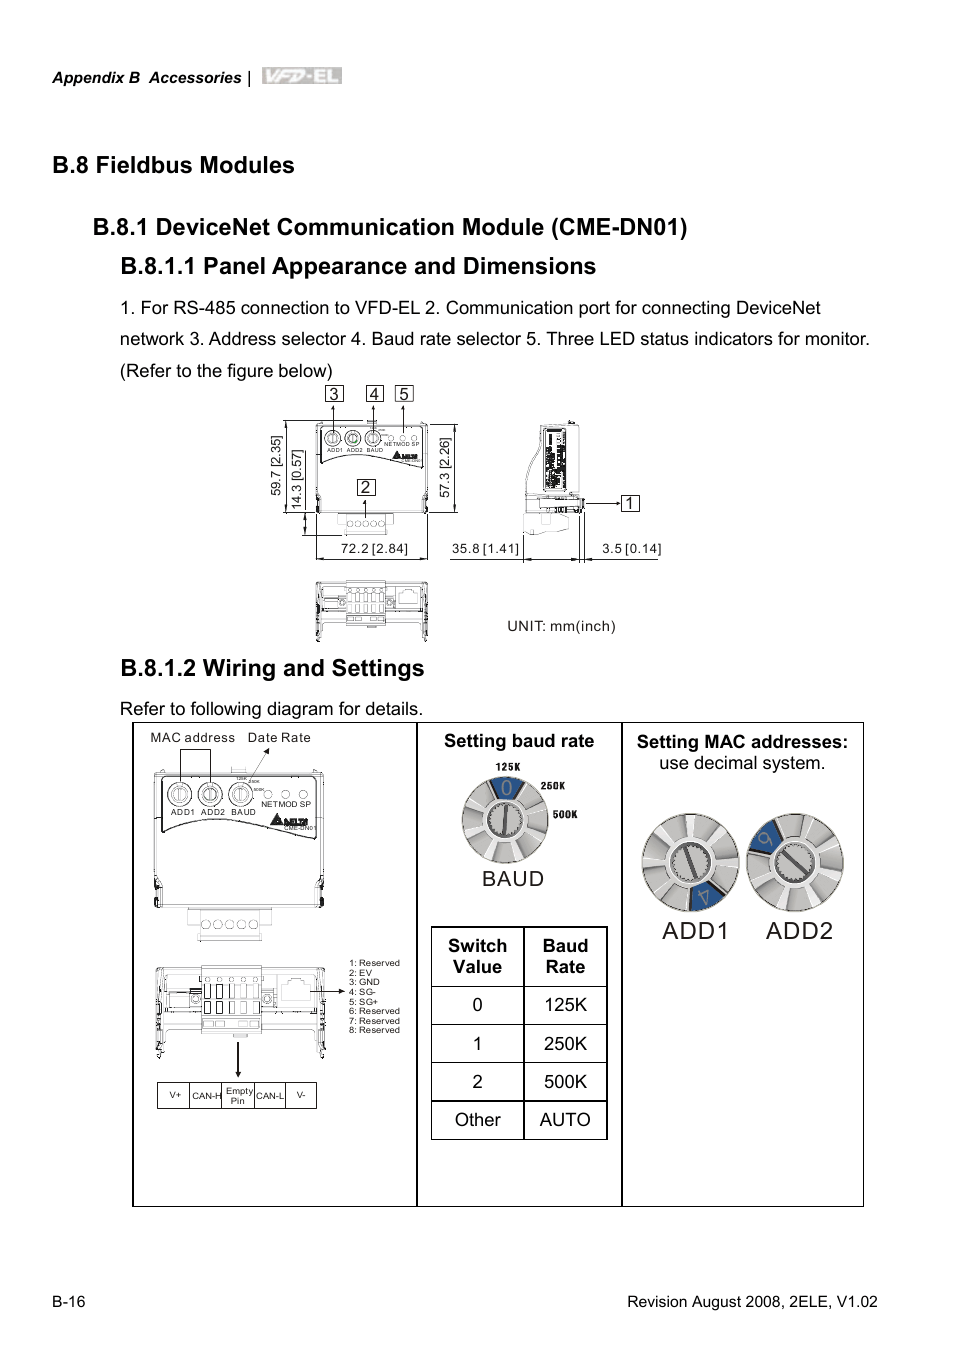 medium resolution of b 8 fieldbus modules b 8 1 devicenet communication module cme dn01 delta vfd el wiring diagram